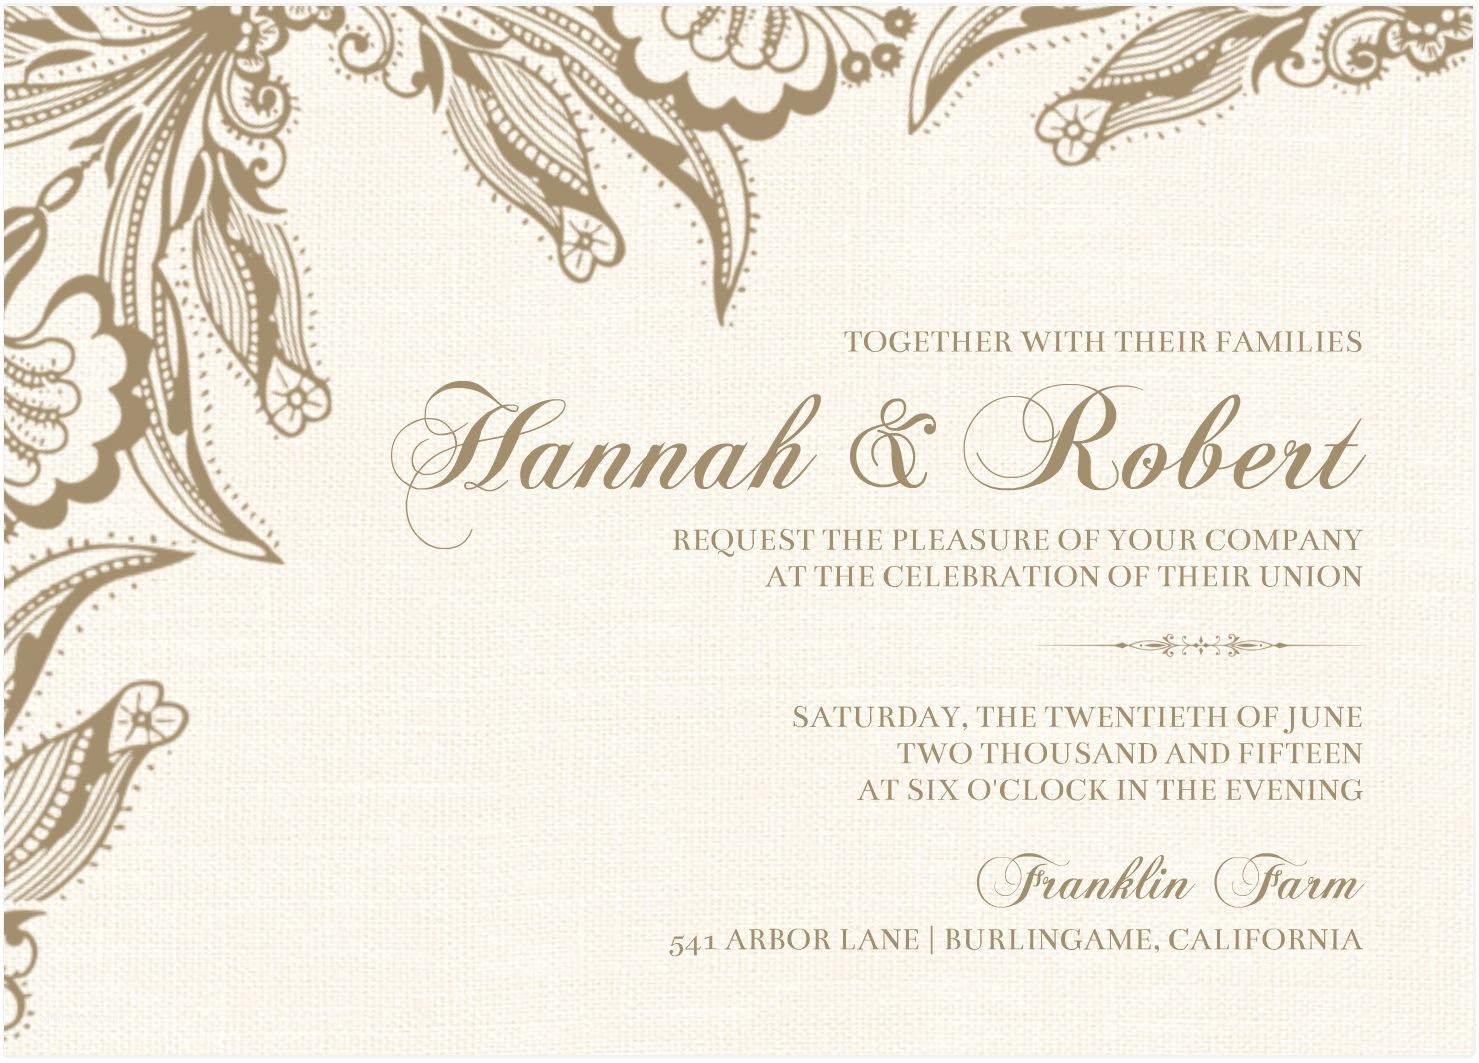 Wedding Invitation Card Design Inspirational Wedding Invitation Card Design Samples